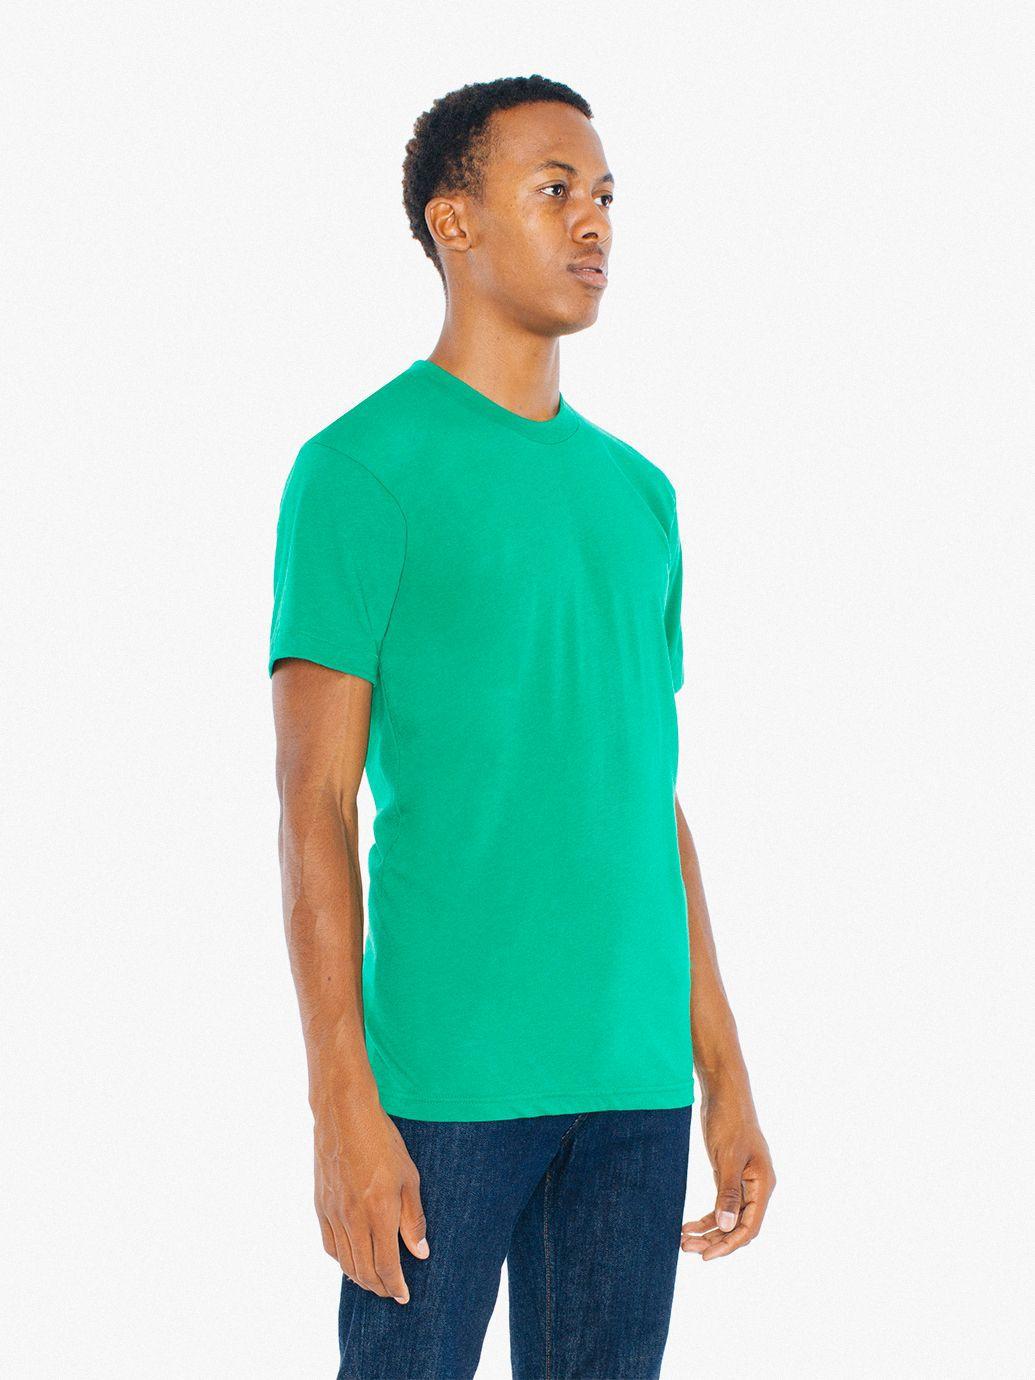 50/50 Crewneck T-Shirt | American Apparel